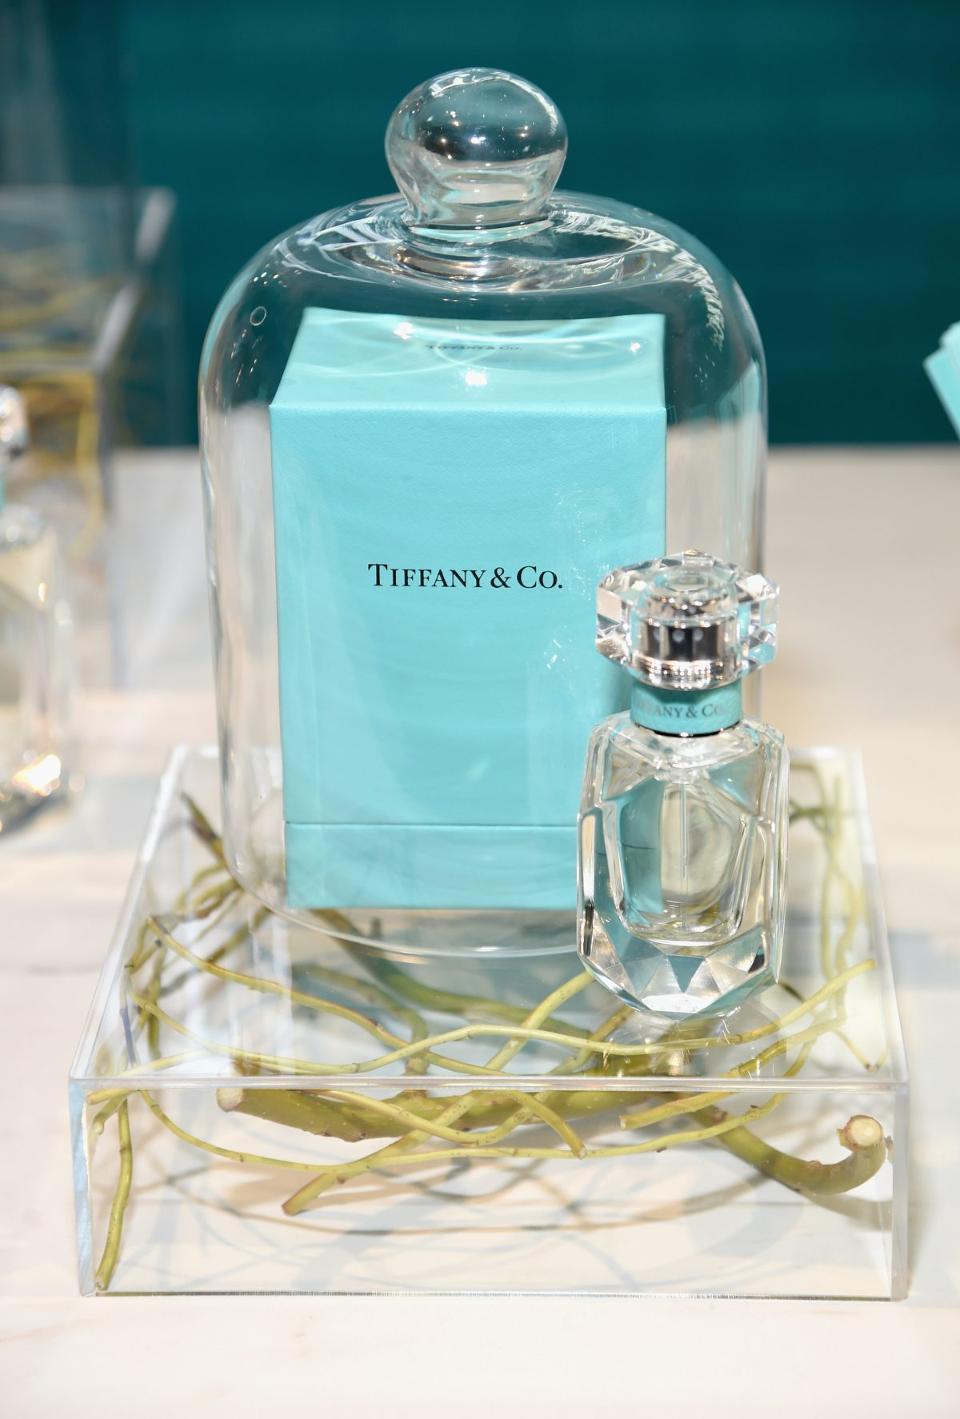 tiffany-profumo